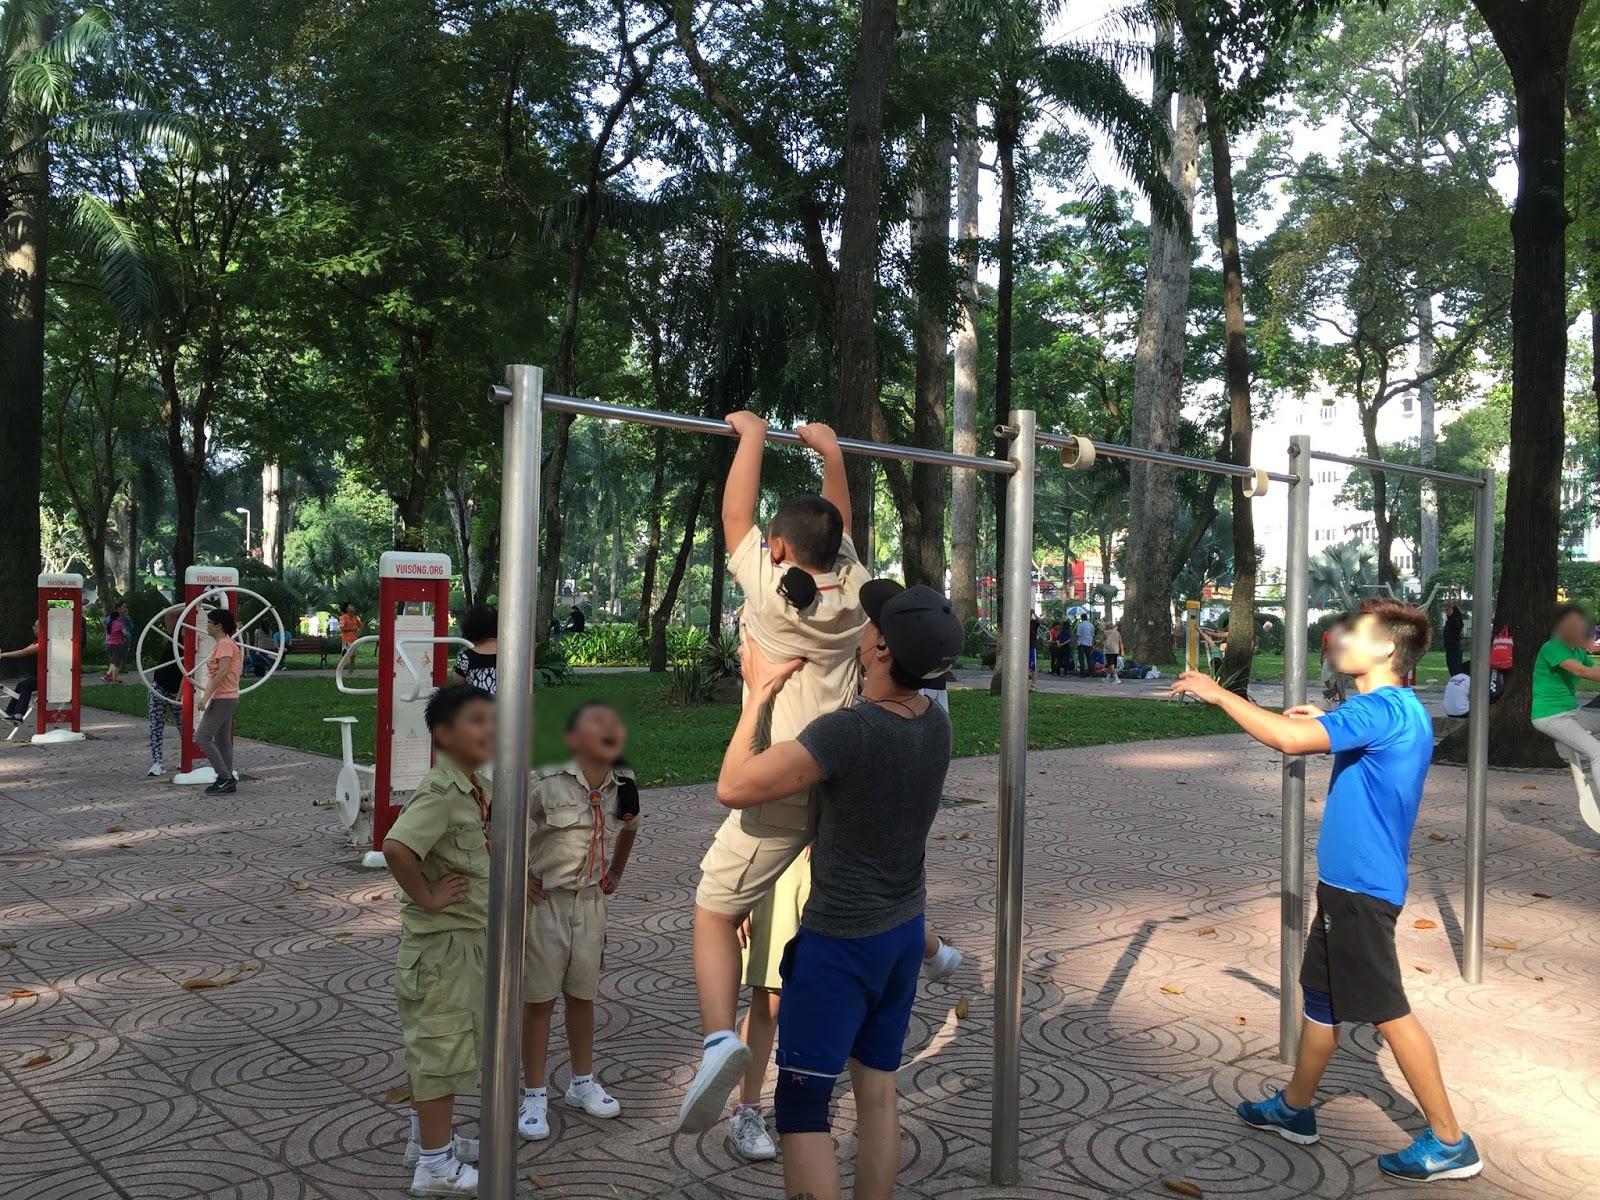 hcmc-vietnam-sport-park ベトナムの公園とアスレチック4